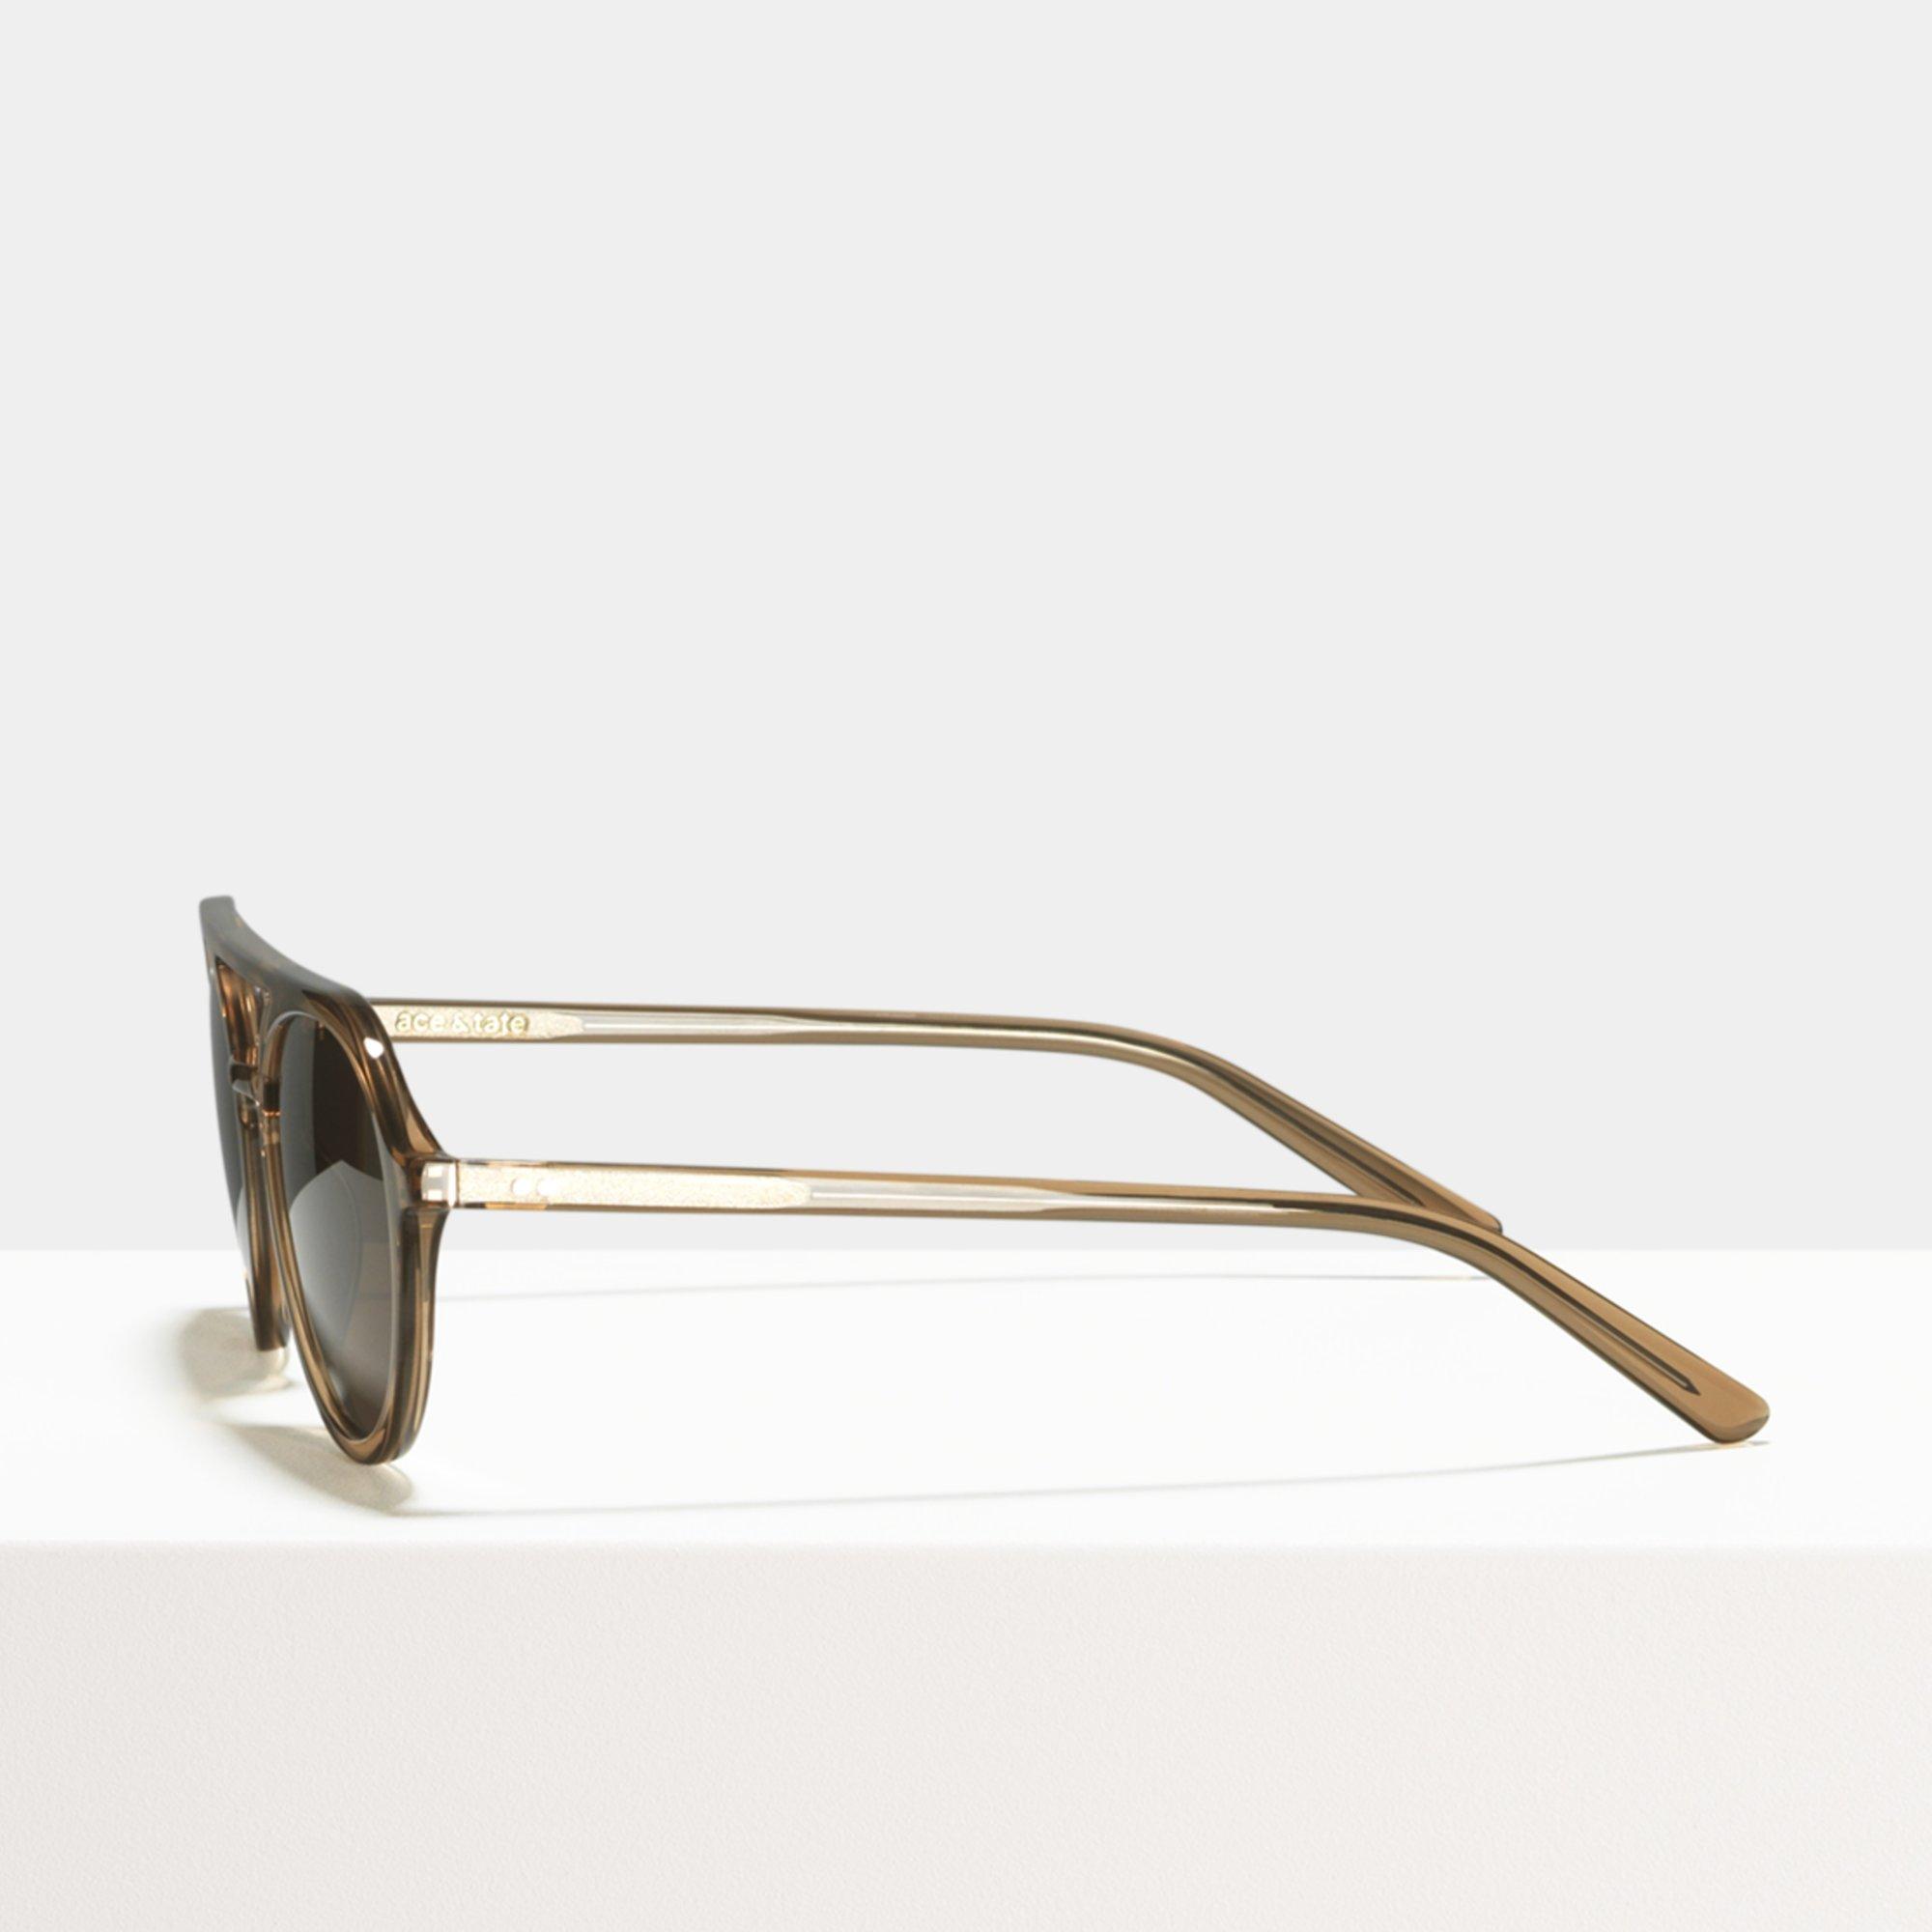 Ace & Tate Sunglasses |  acetate in Brown